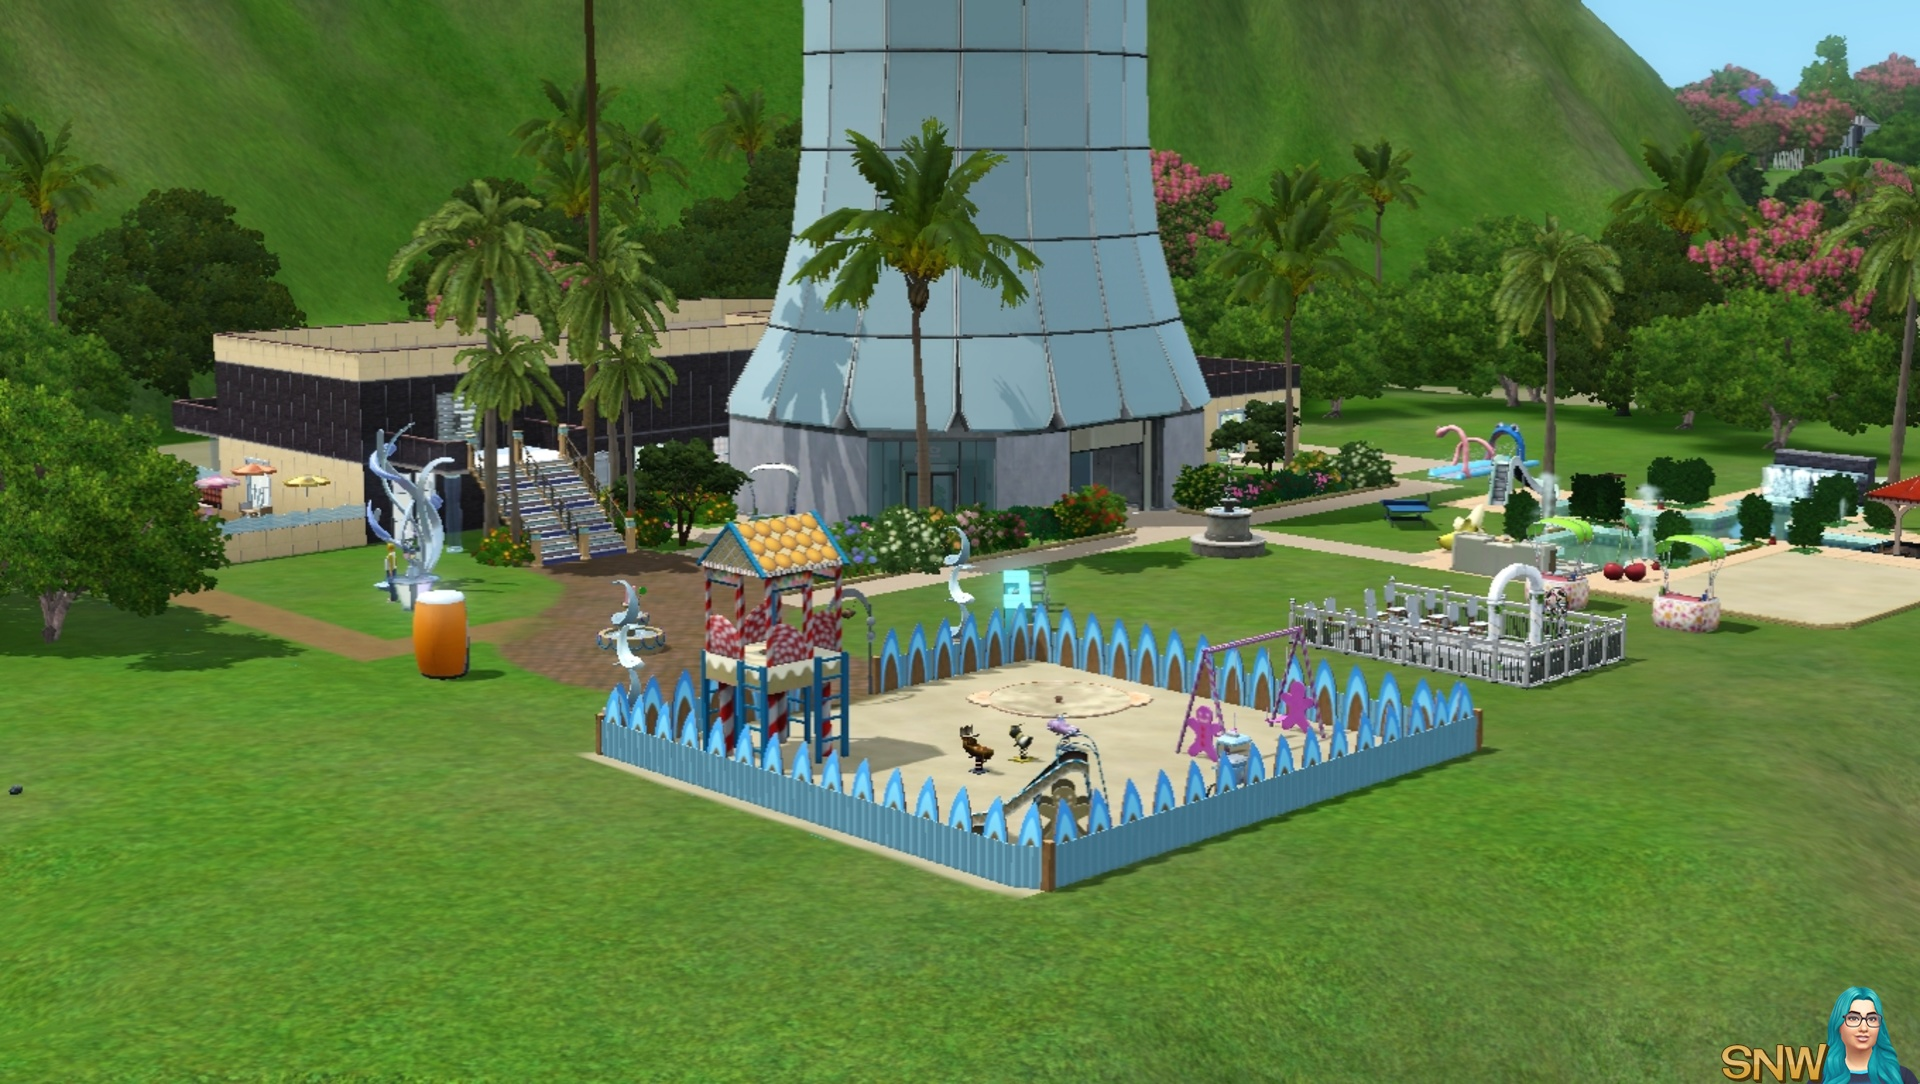 Modern Familie Resort Snw Simsnetwork Com